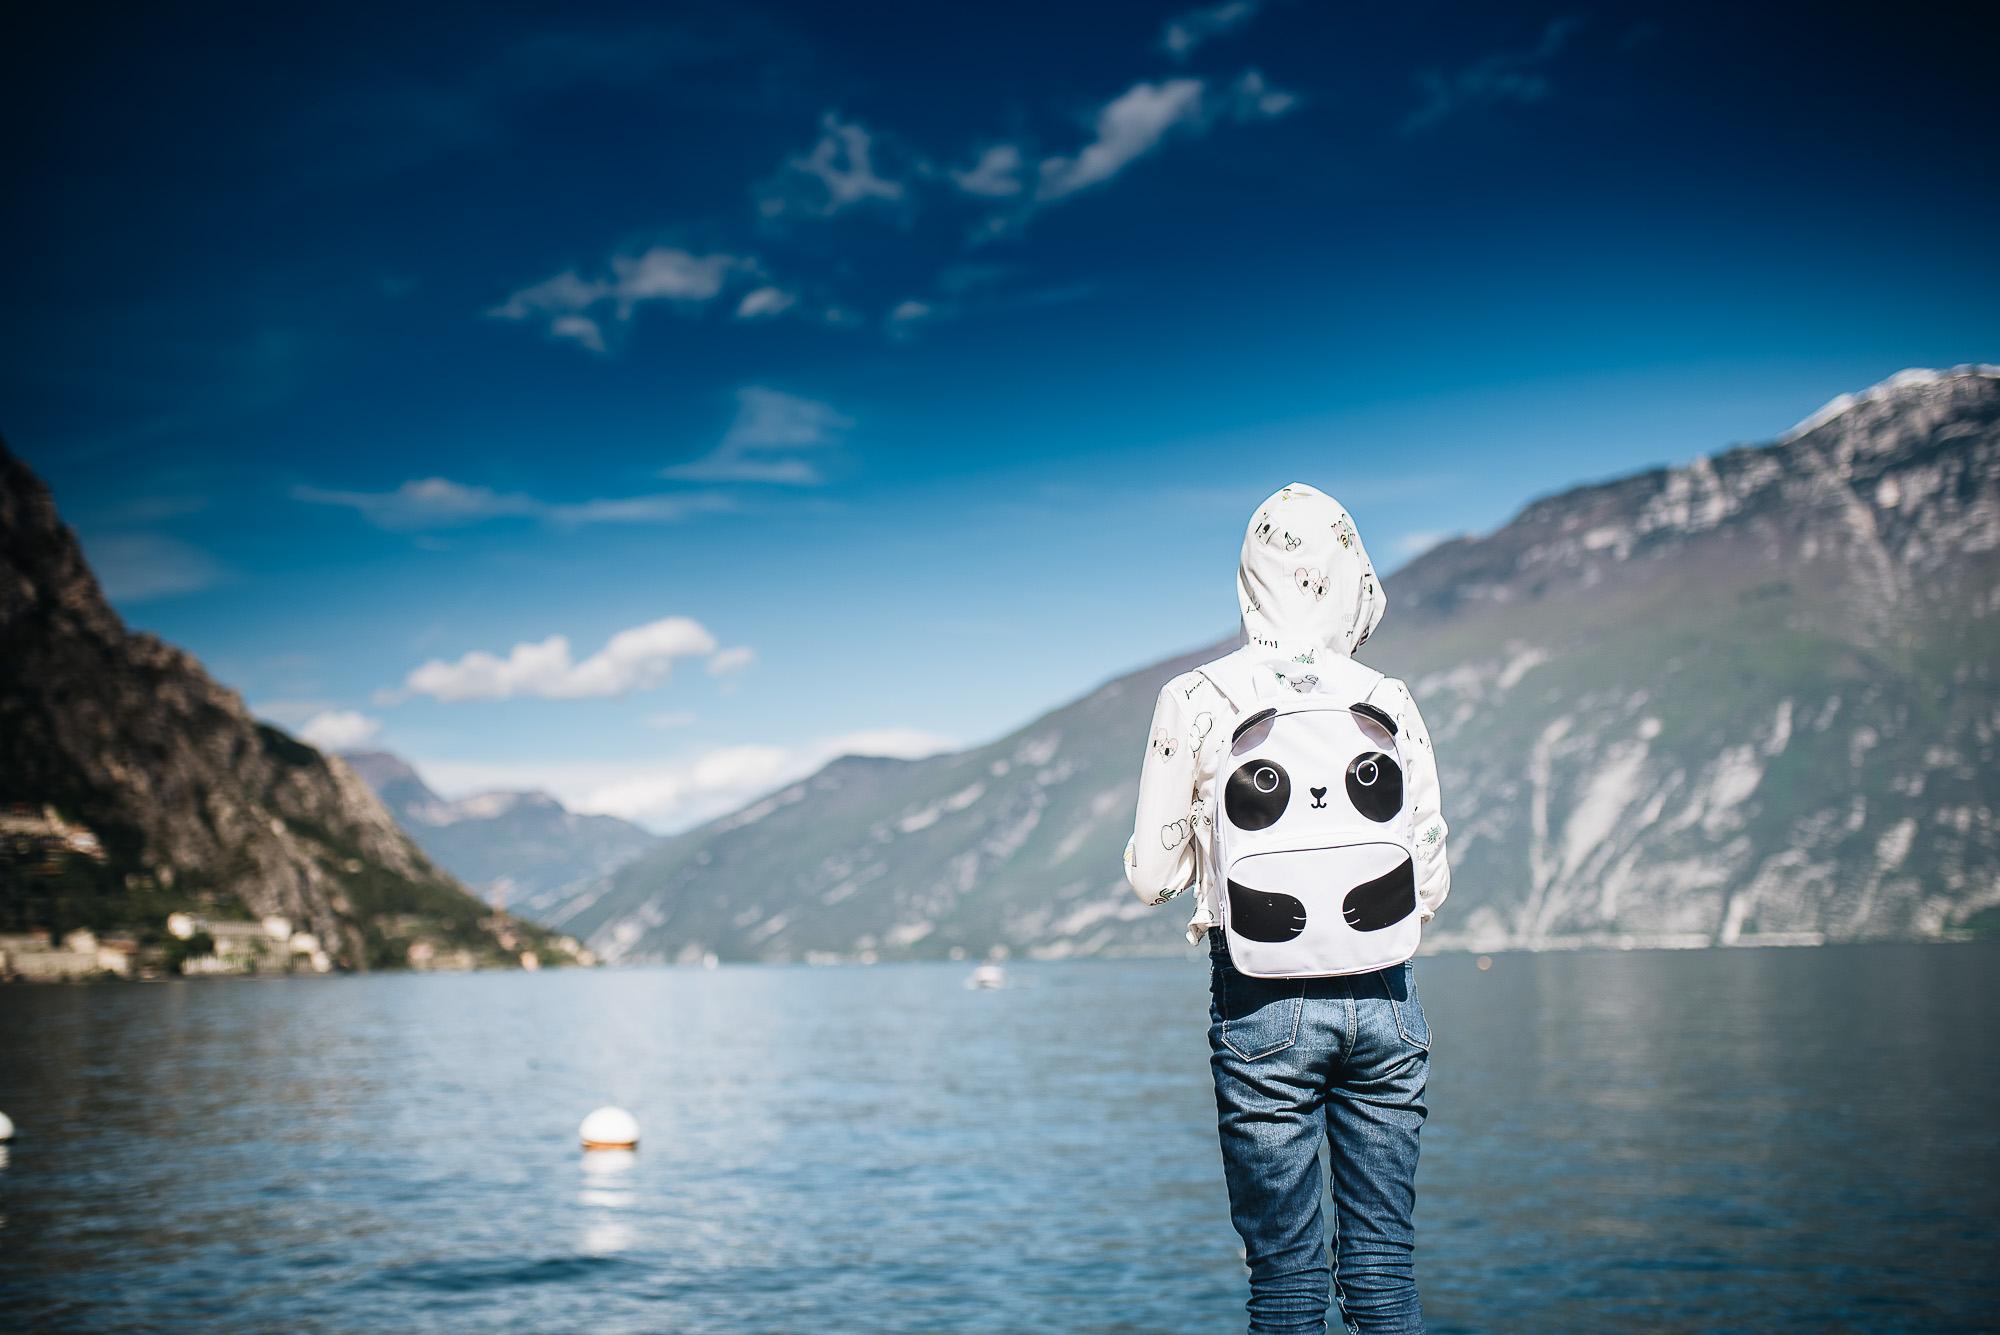 OurBeautifulAdventure-LakeGarda-Italy-Blog-1309.jpg